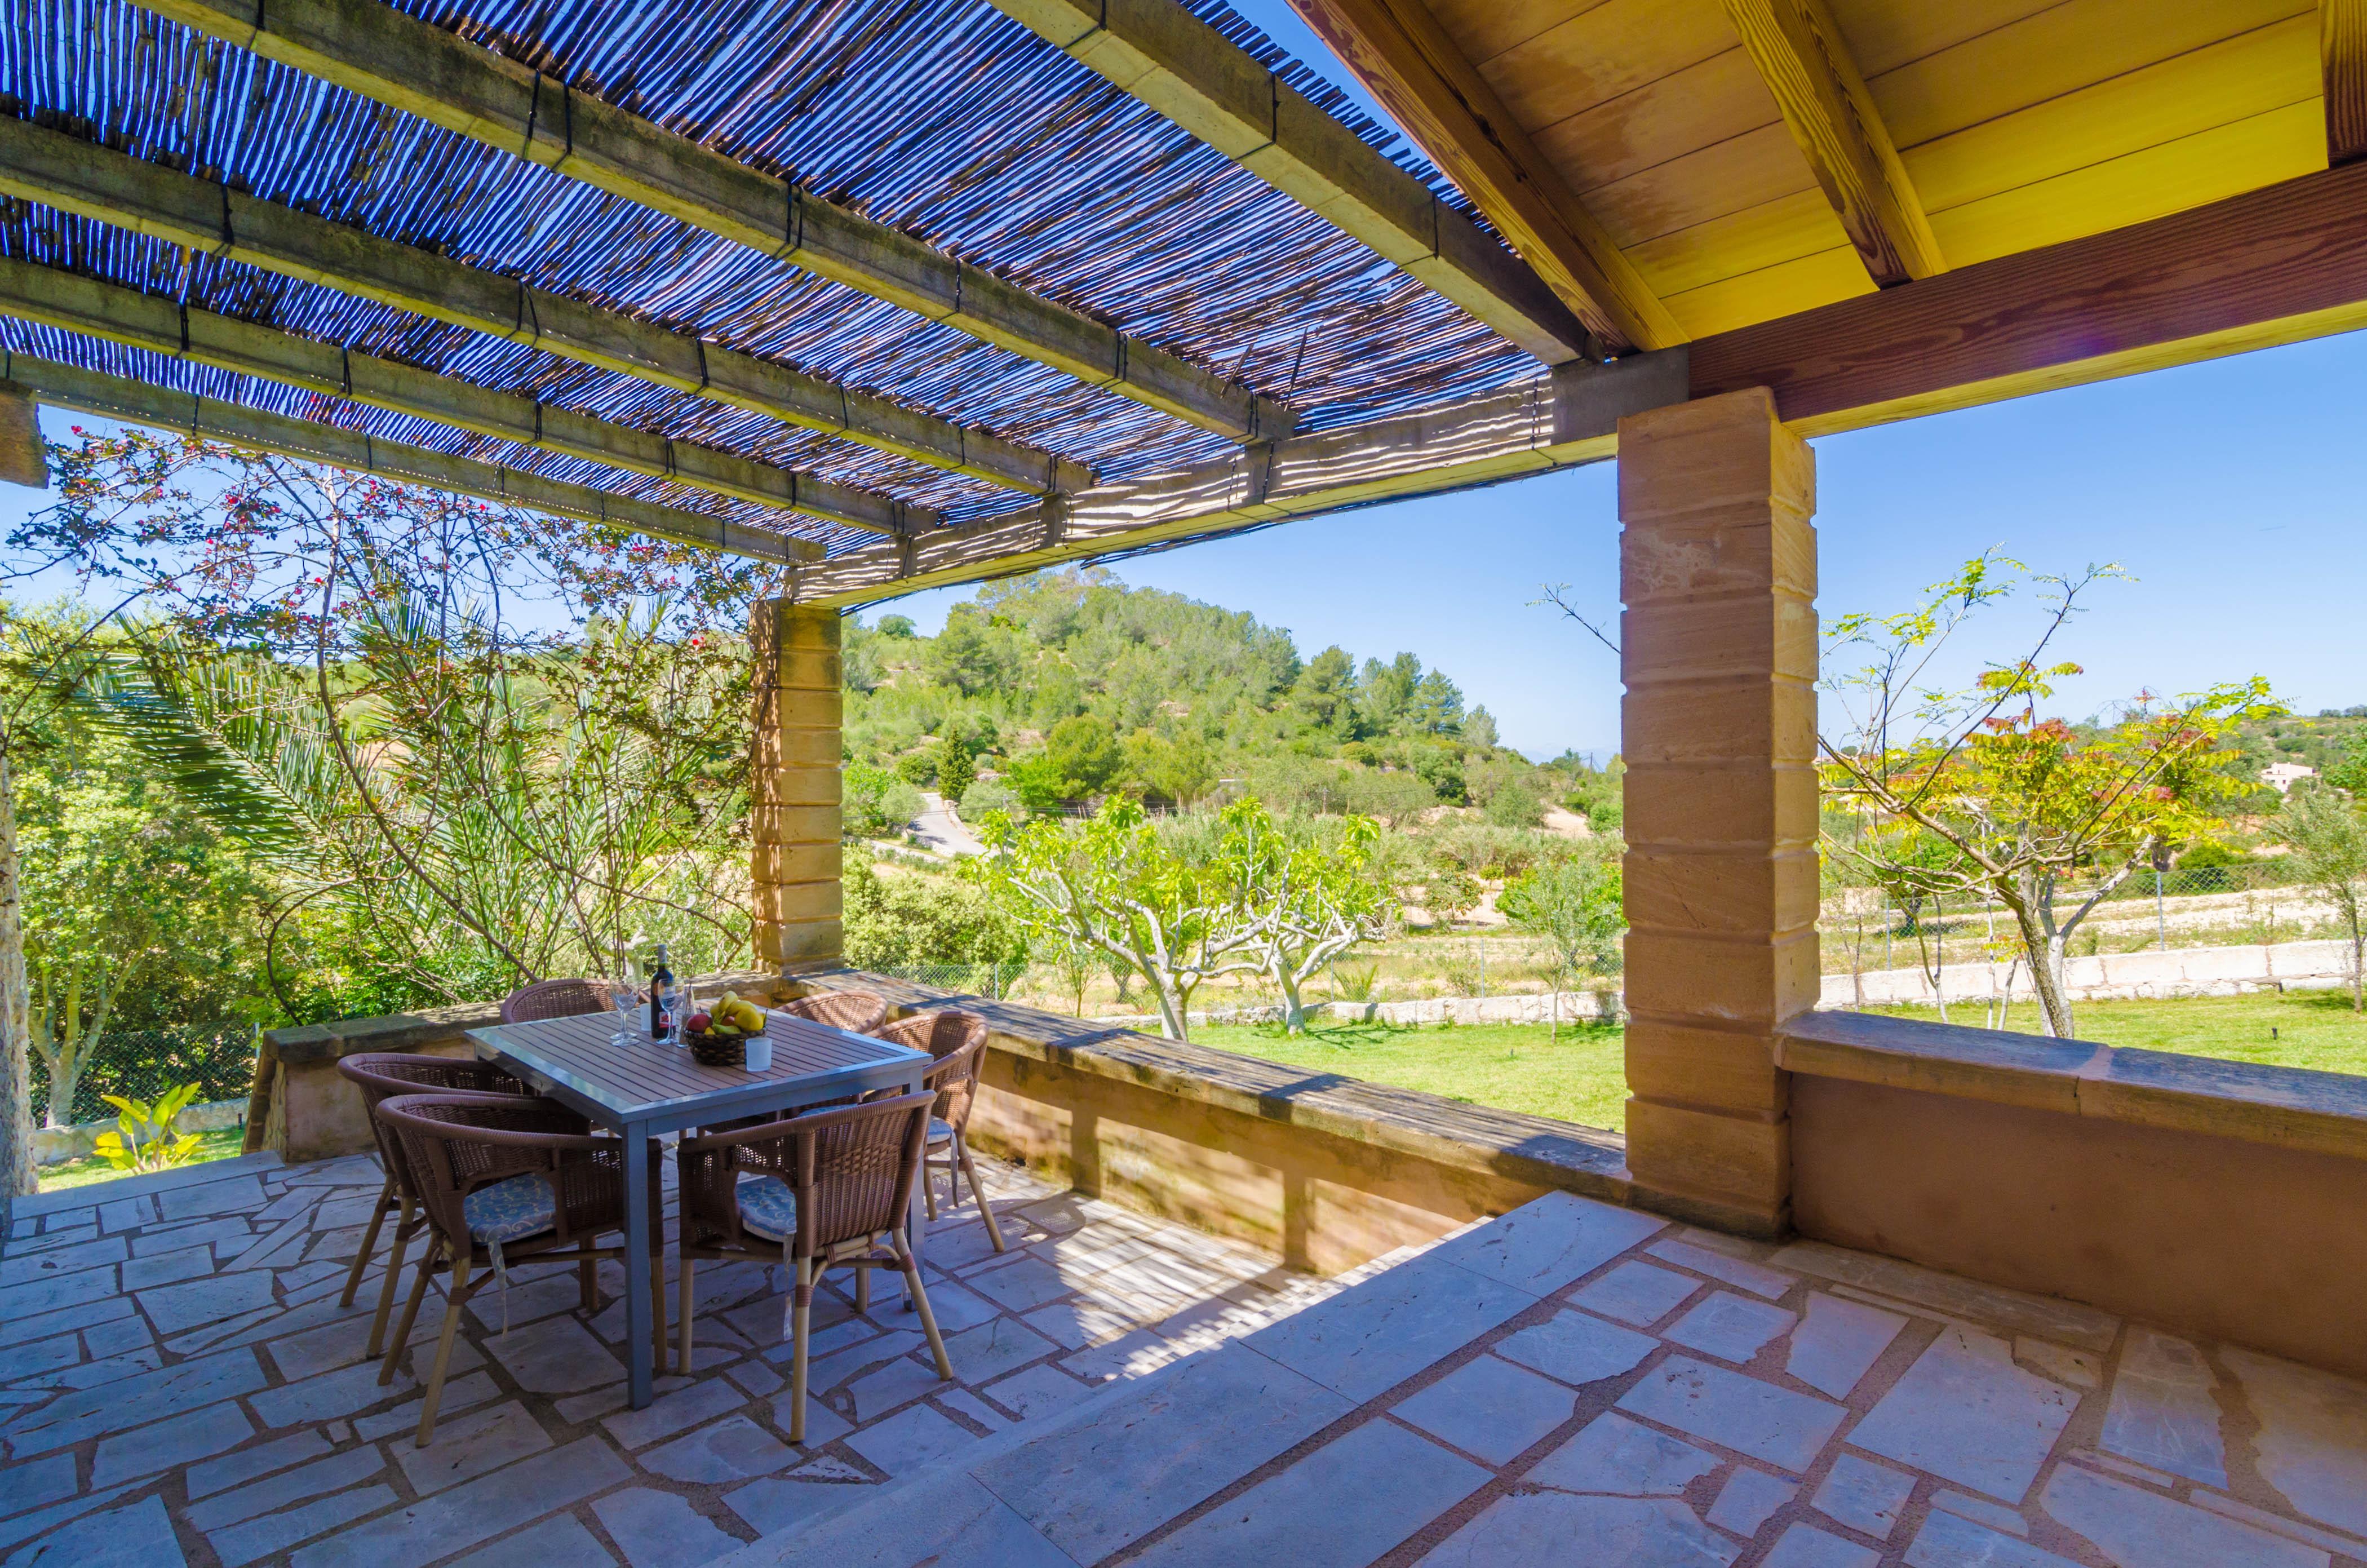 Ferienhaus SON MACIA (2186582), Son Macià, Mallorca, Balearische Inseln, Spanien, Bild 13